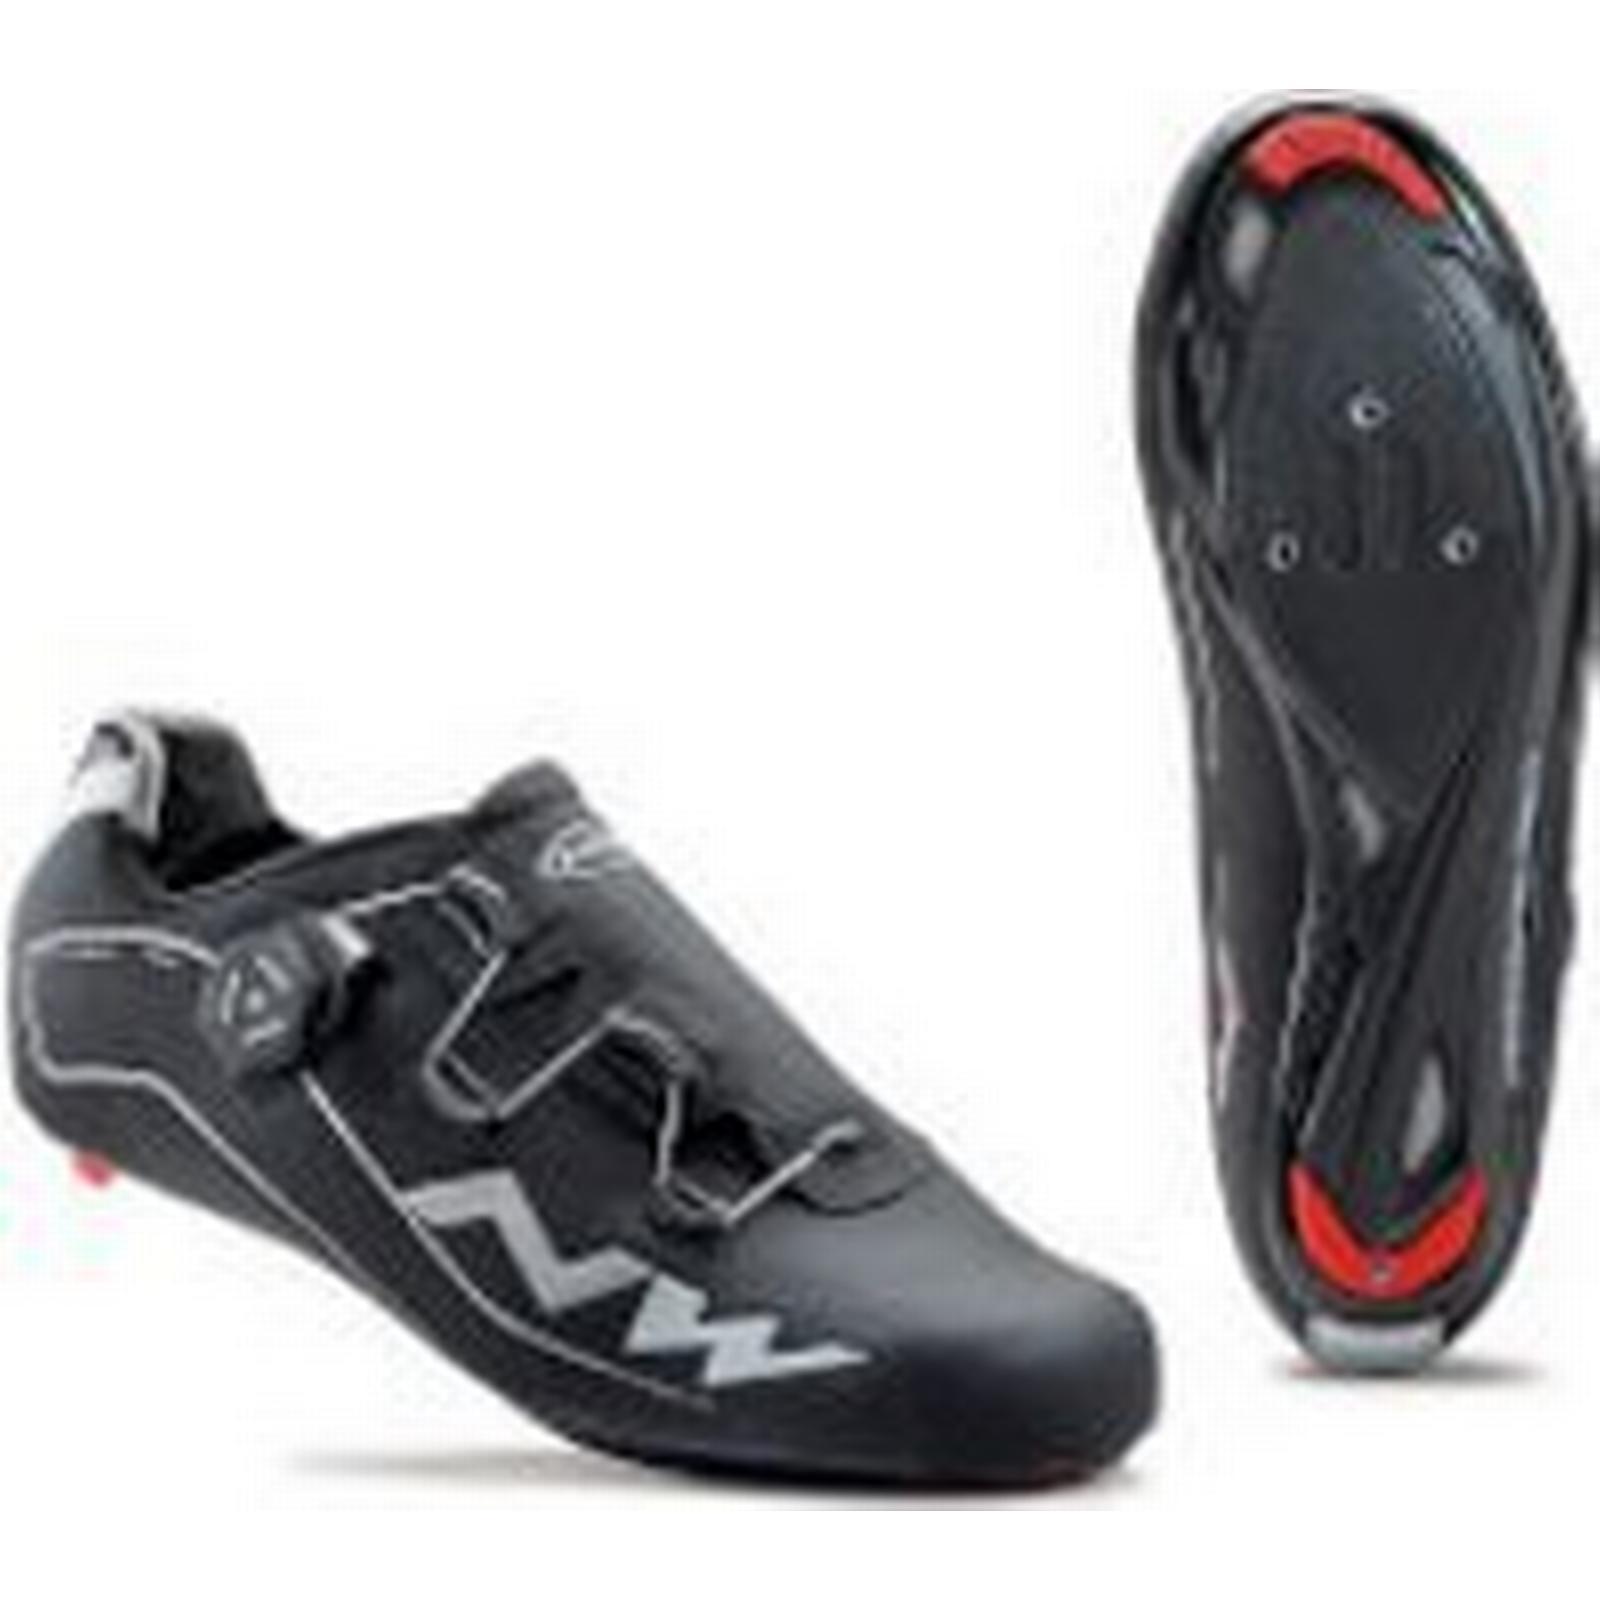 Northwave UK Flash Thinsulate Winter Shoes - Black - UK Northwave 12/EU 46 - Black a3dd69